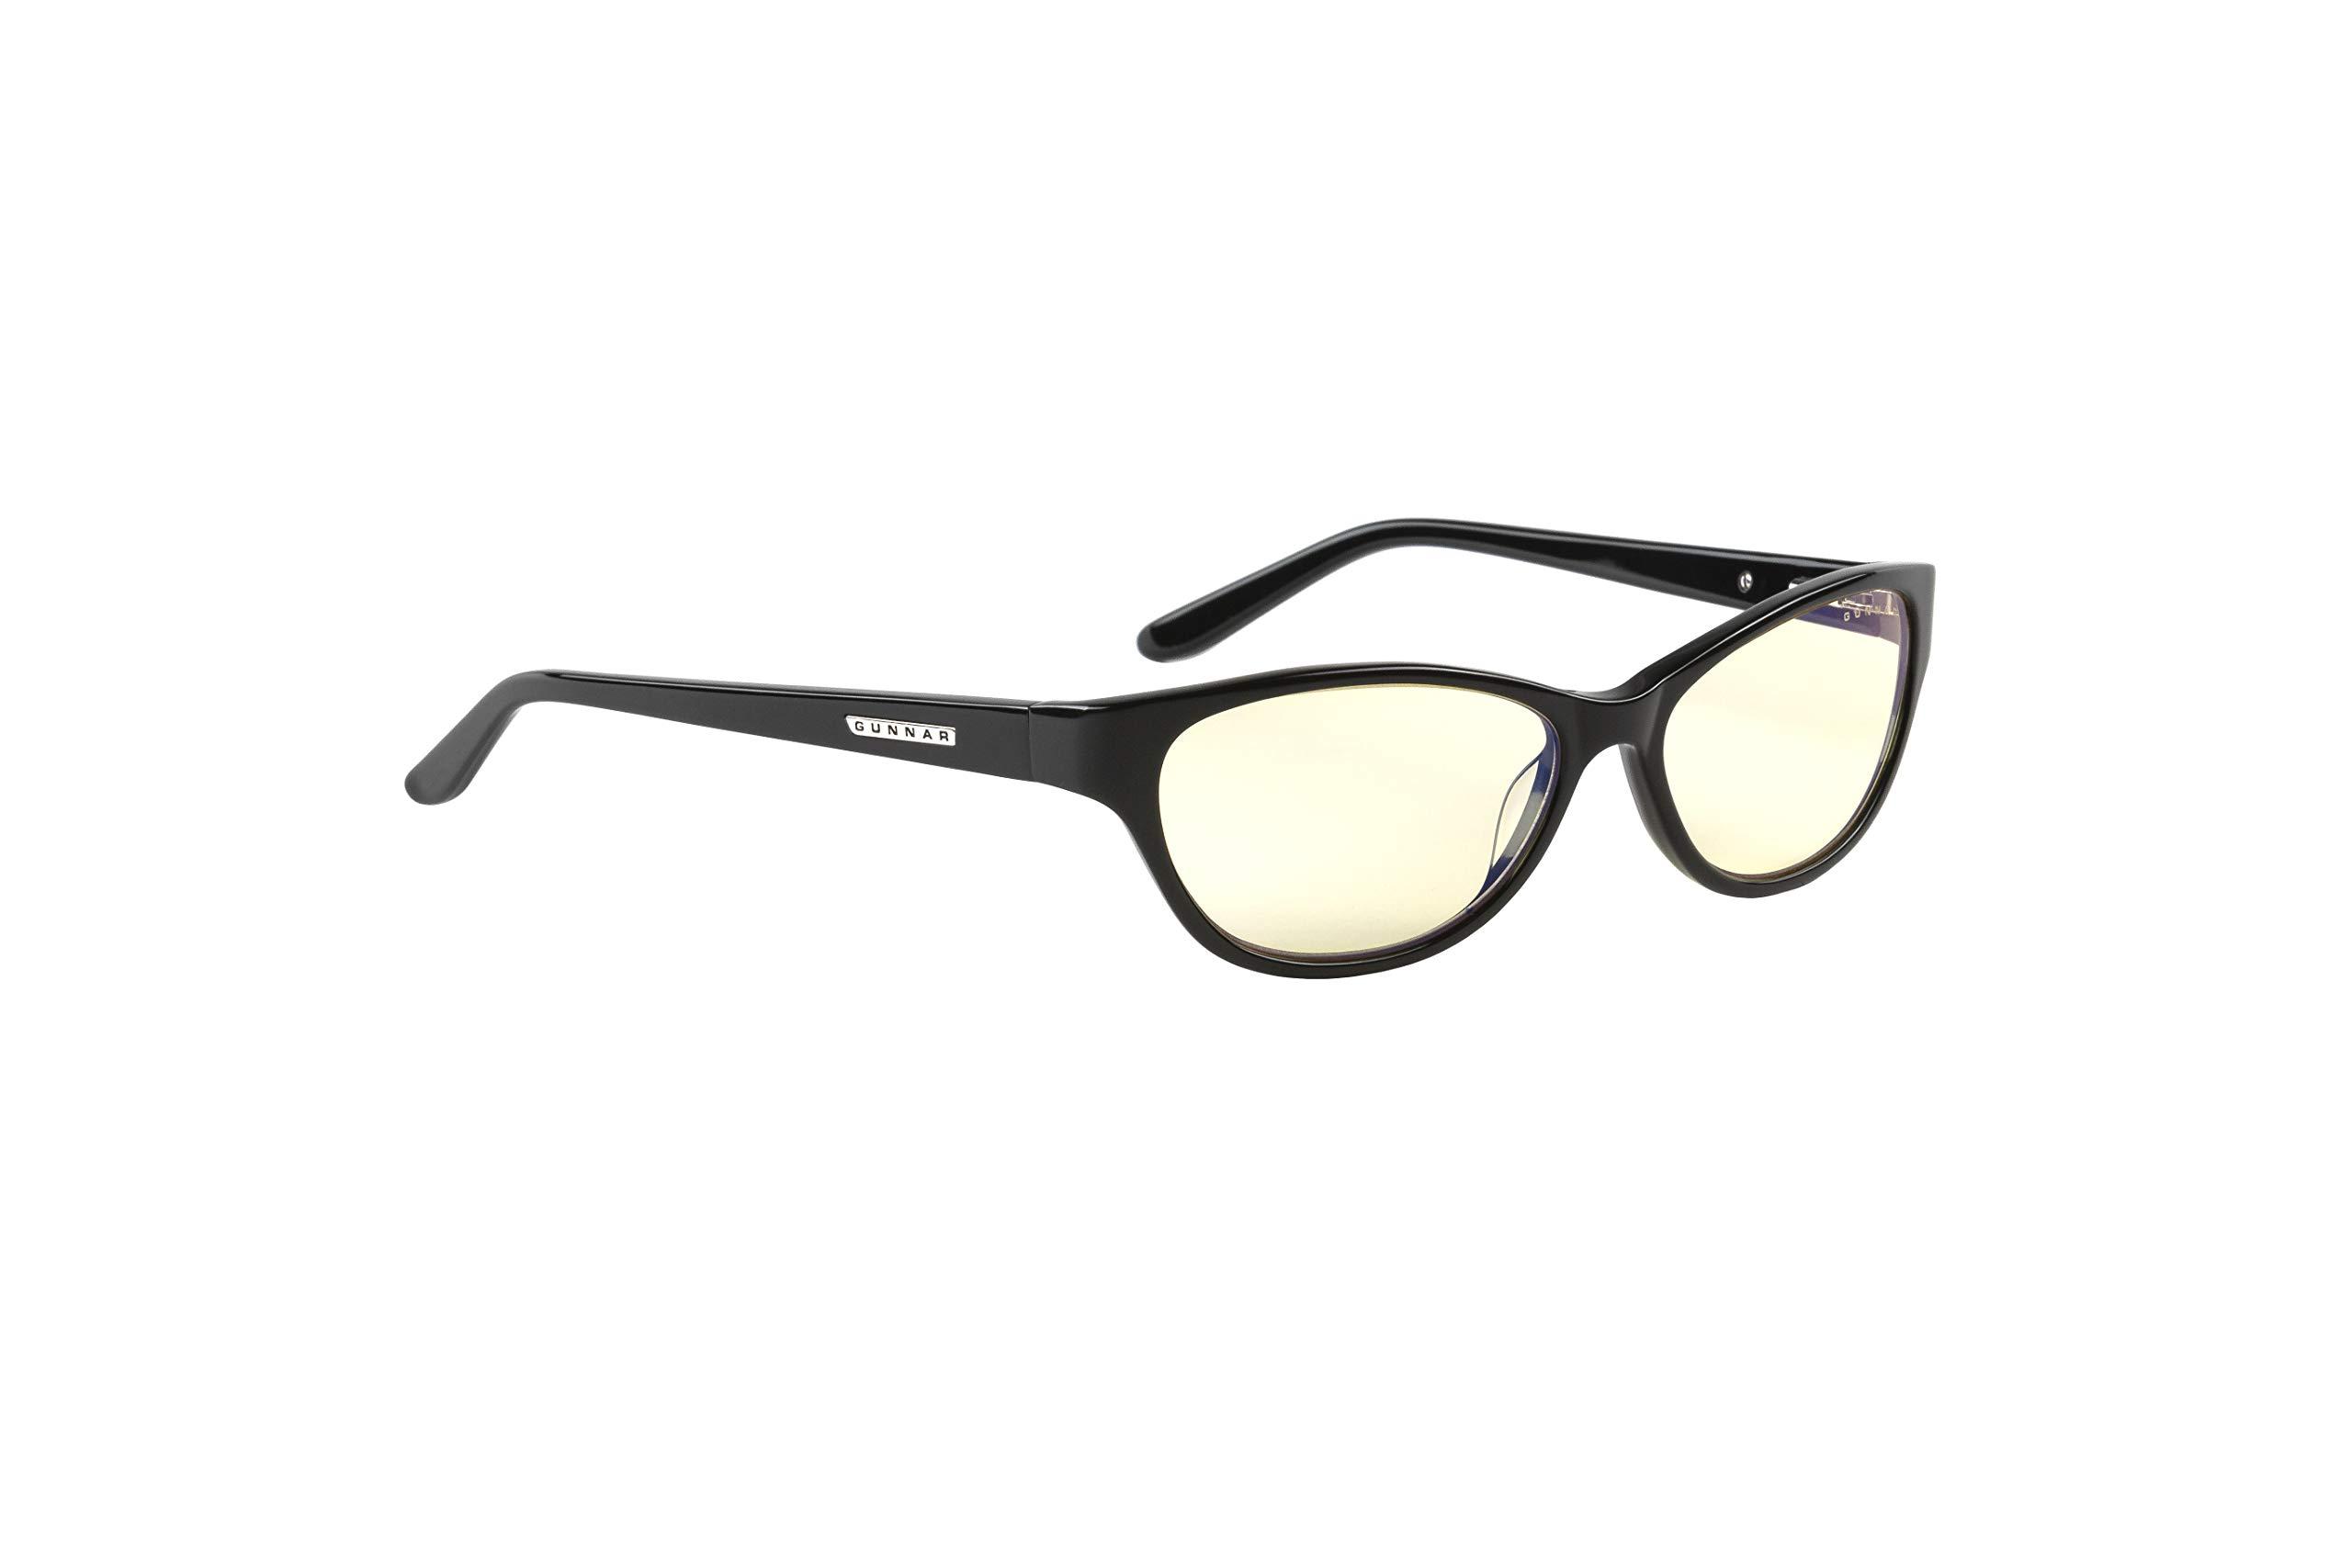 GUNNAR Reading Glasses/Jewel 1.25x Power, Amber Tint - Patented Lens, Reduce Digital Eye Strain, Block 65% of Harmful Blue Light